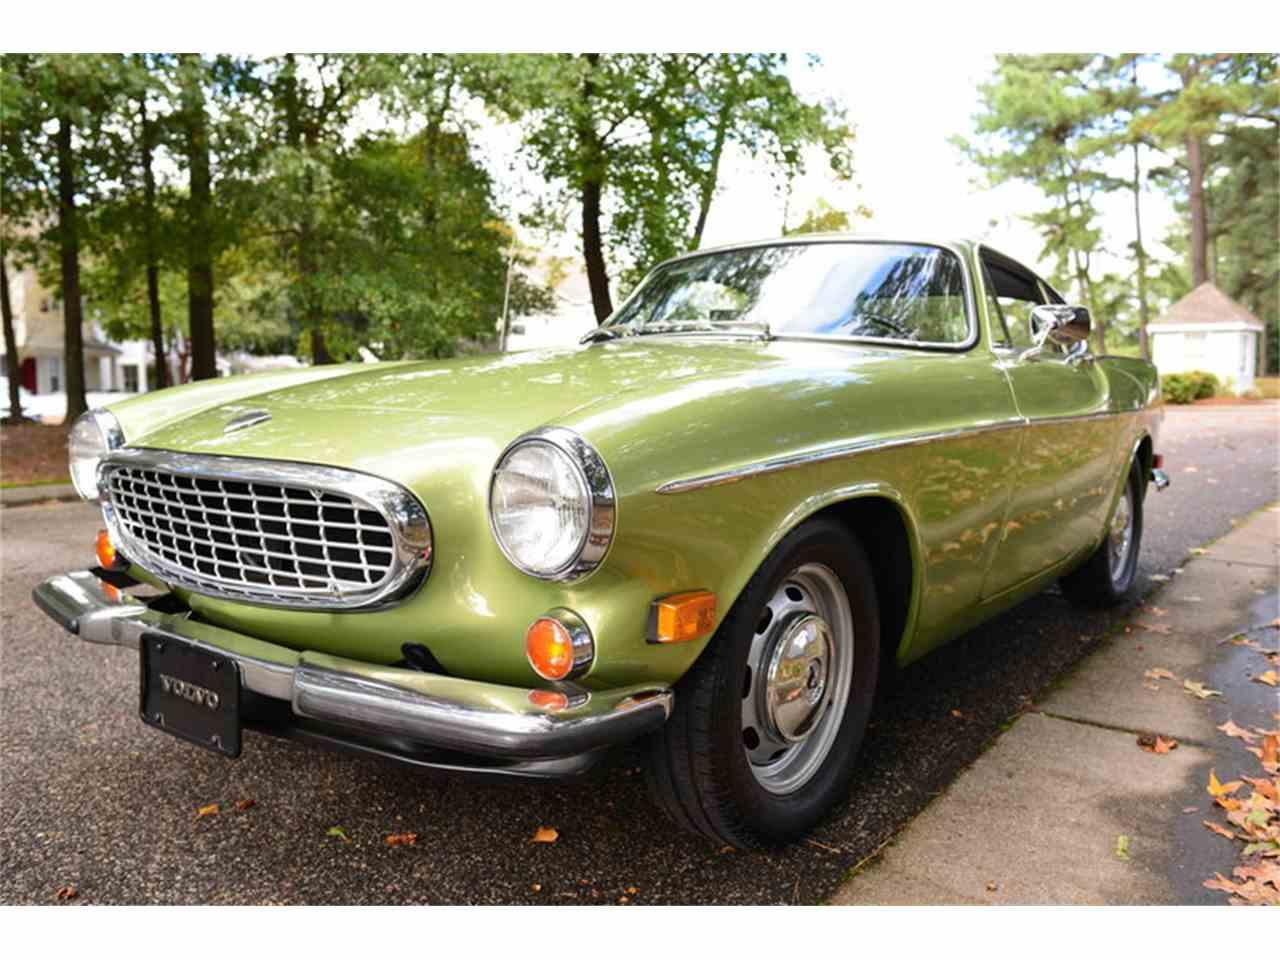 1968 Volvo 1800S for Sale | ClassicCars.com | CC-1034120